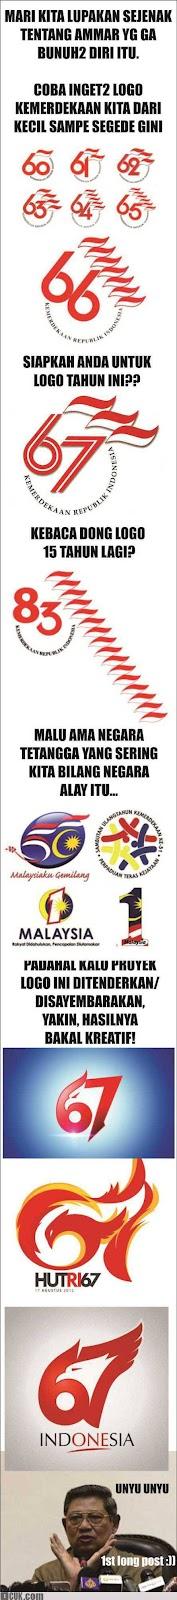 Logo Kemerdekaan Indonesia